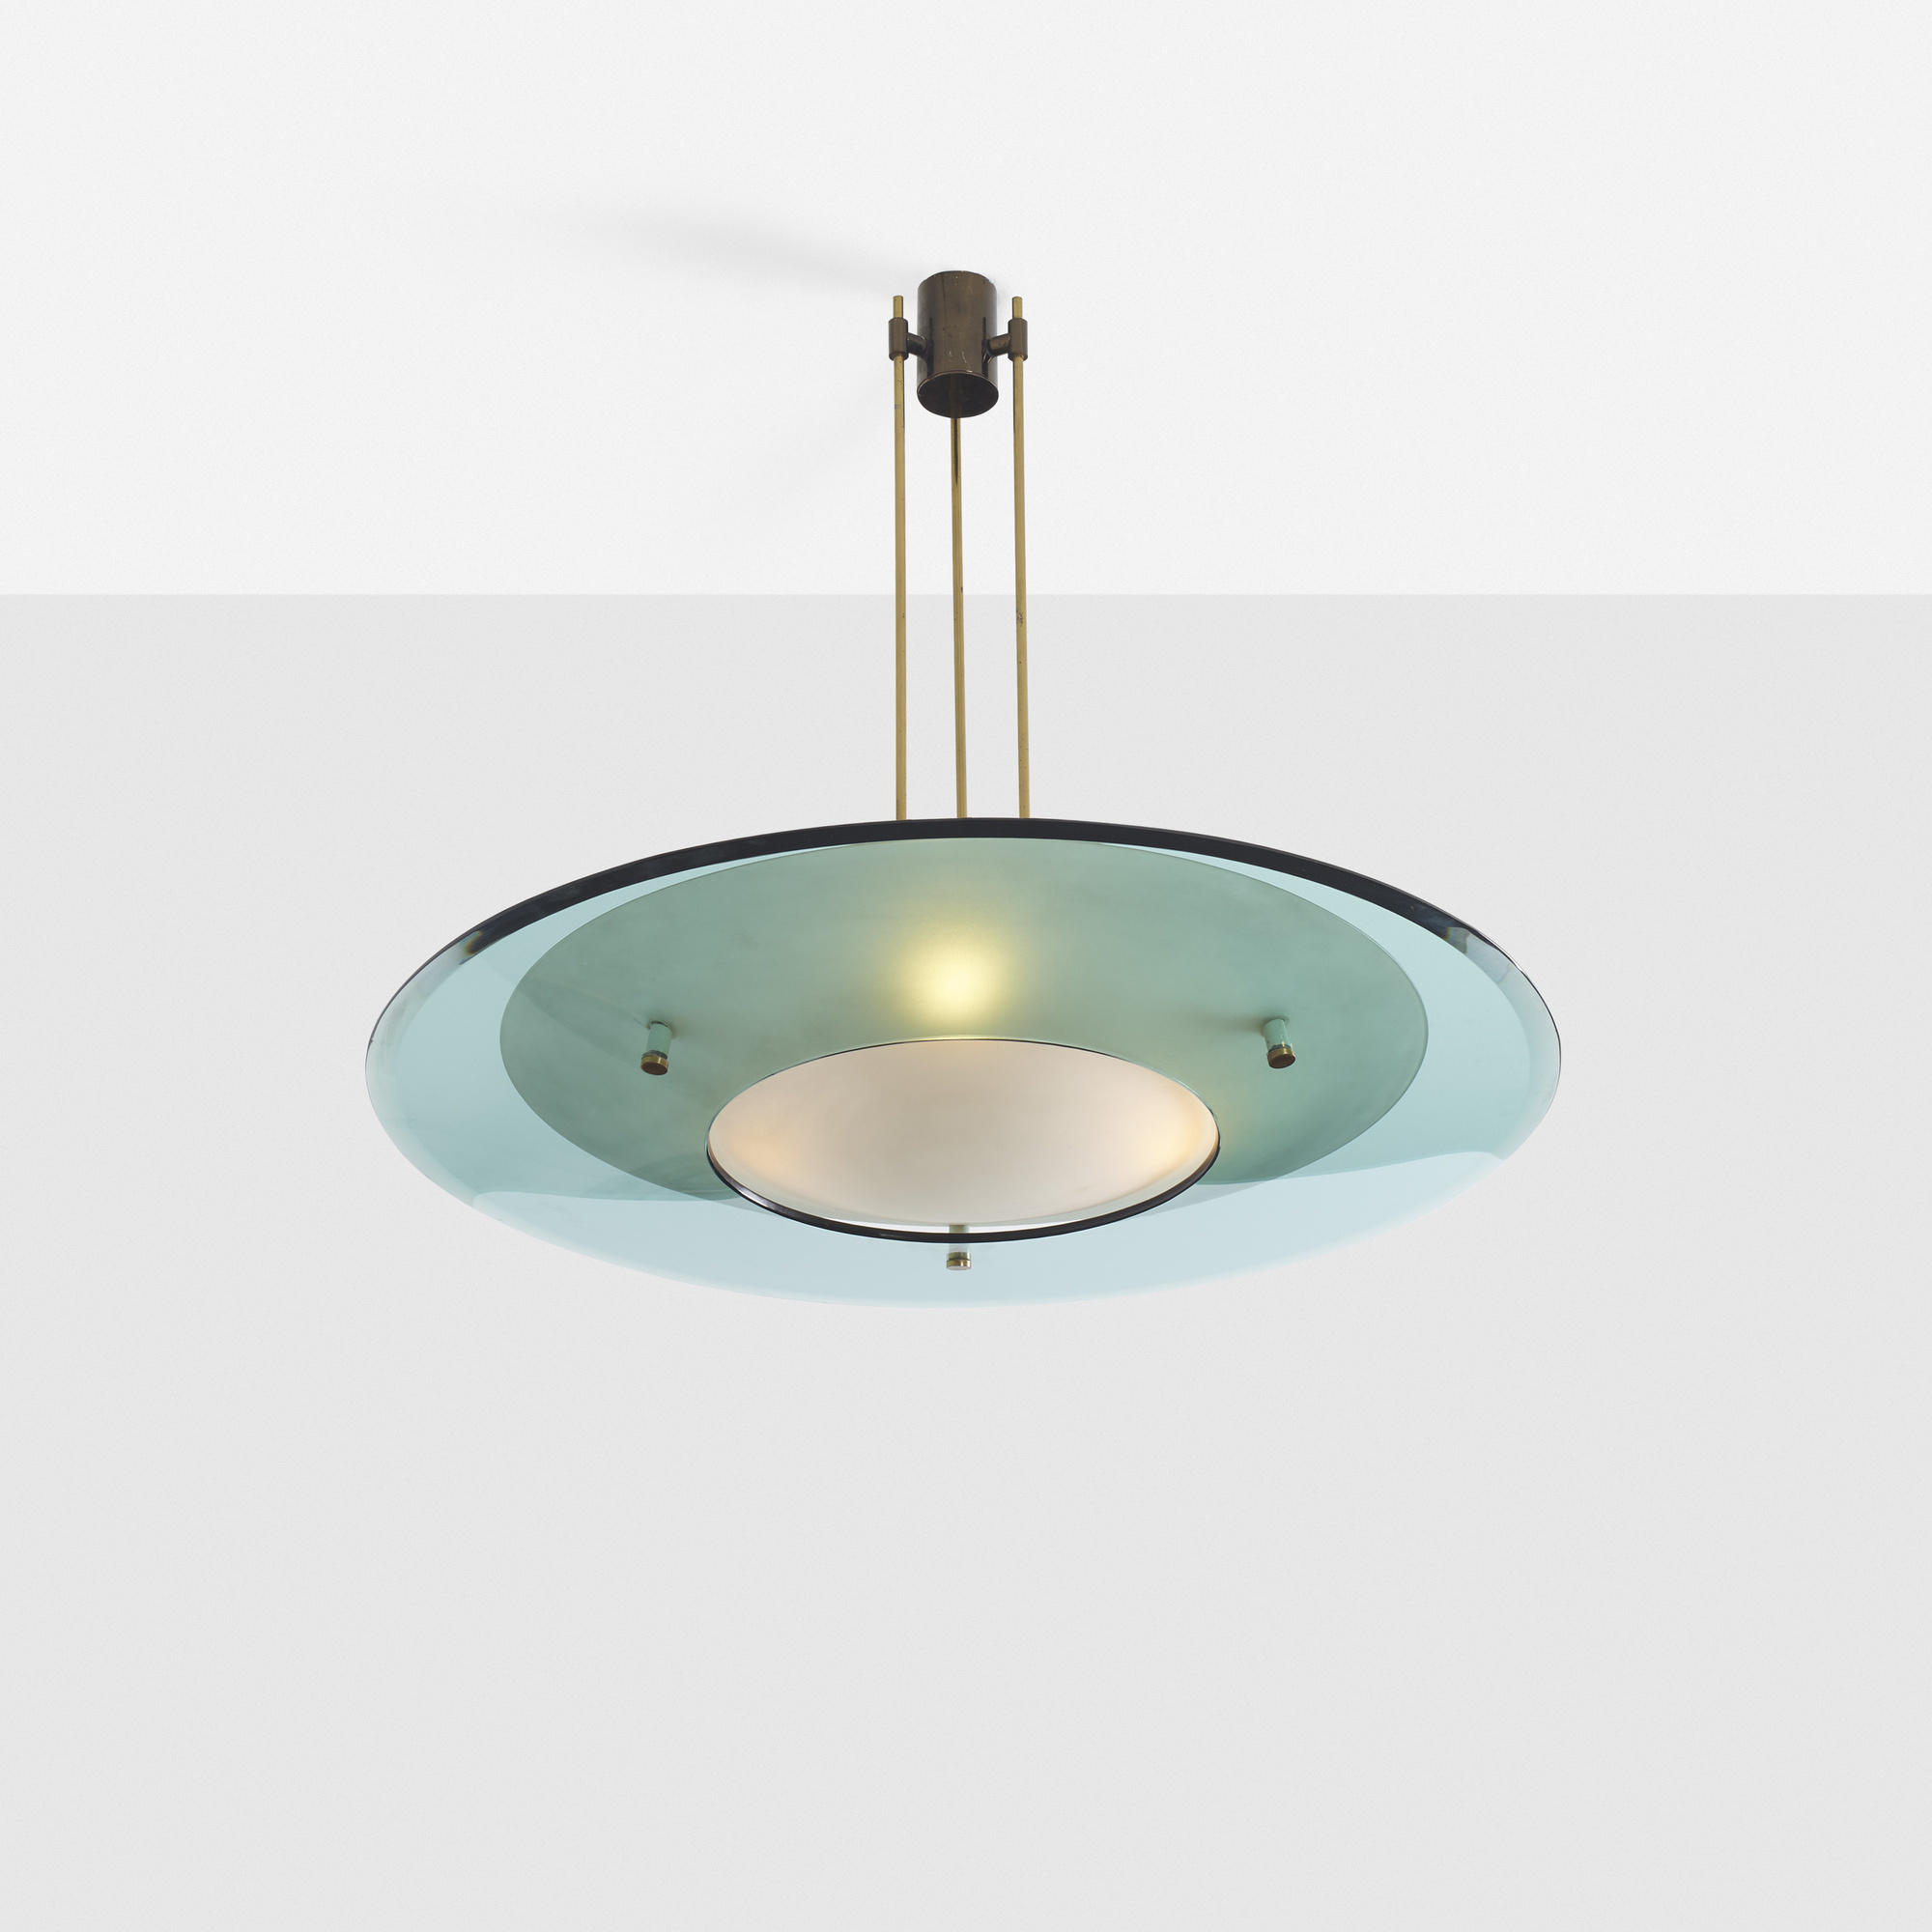 260: Max Ingrand / chandelier, model 2097 (1 of 1)